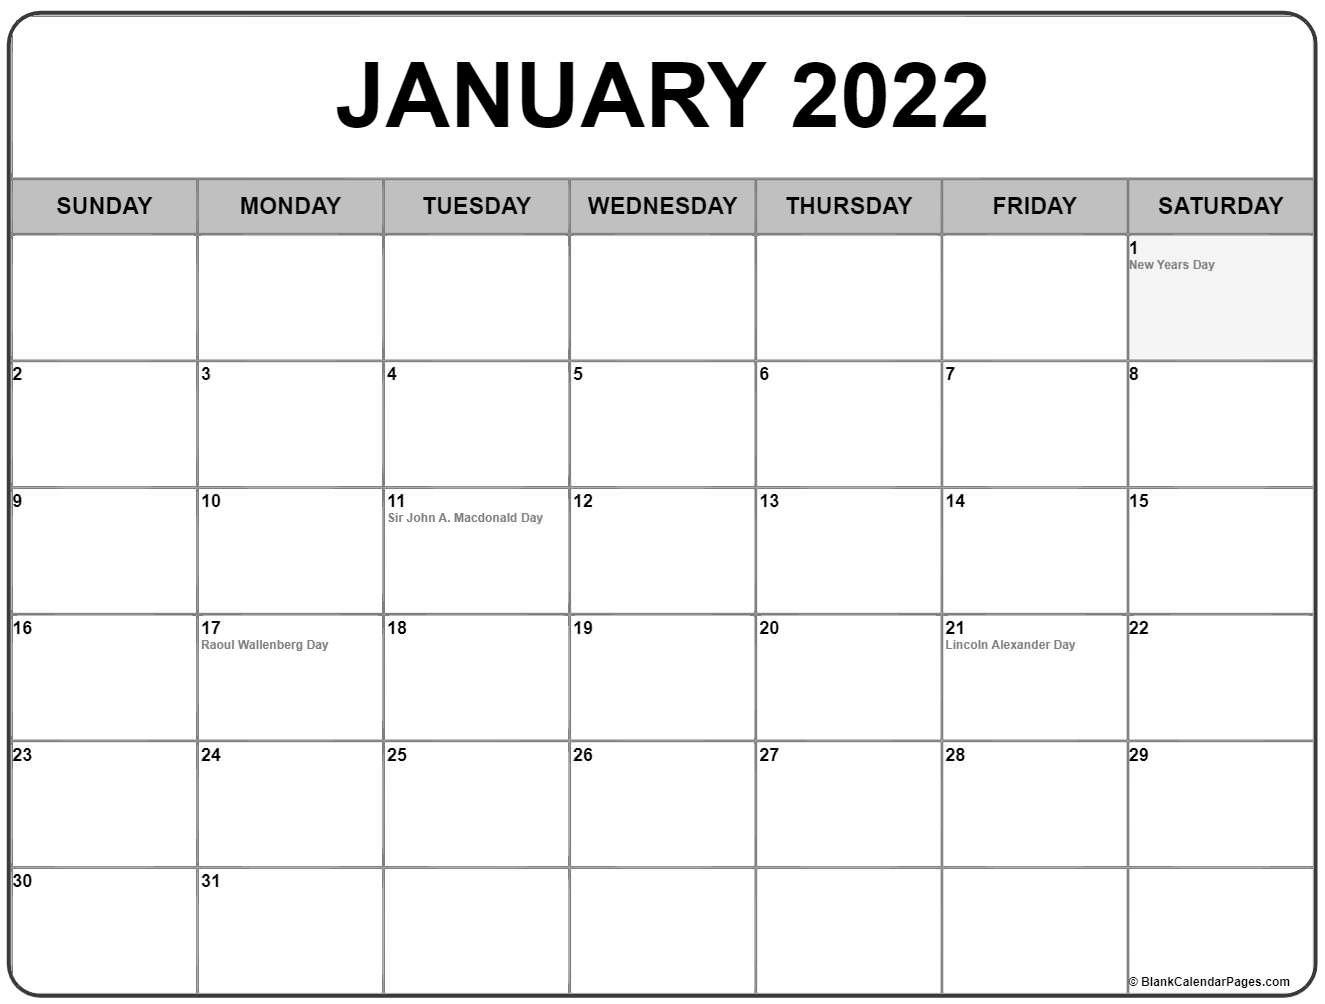 January 2022 With Holidays Calendar Pertaining To Empty Calendar January 2022